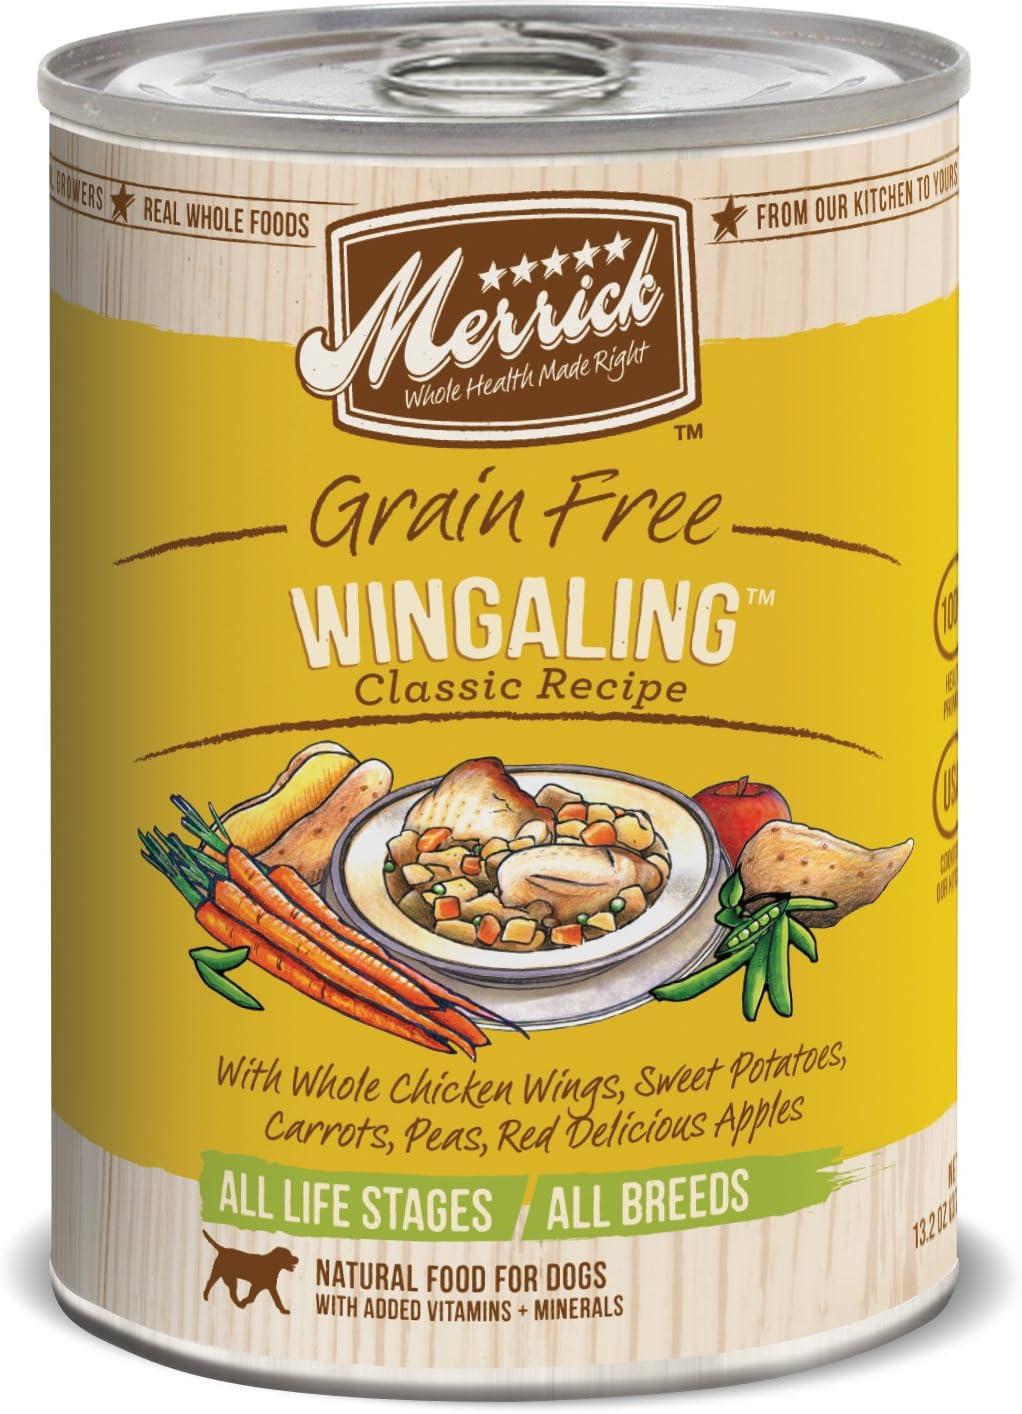 Merrick Classic Grain Free Wangling Wet Dog Food, 13.2 Oz, Case Of 12 Cans